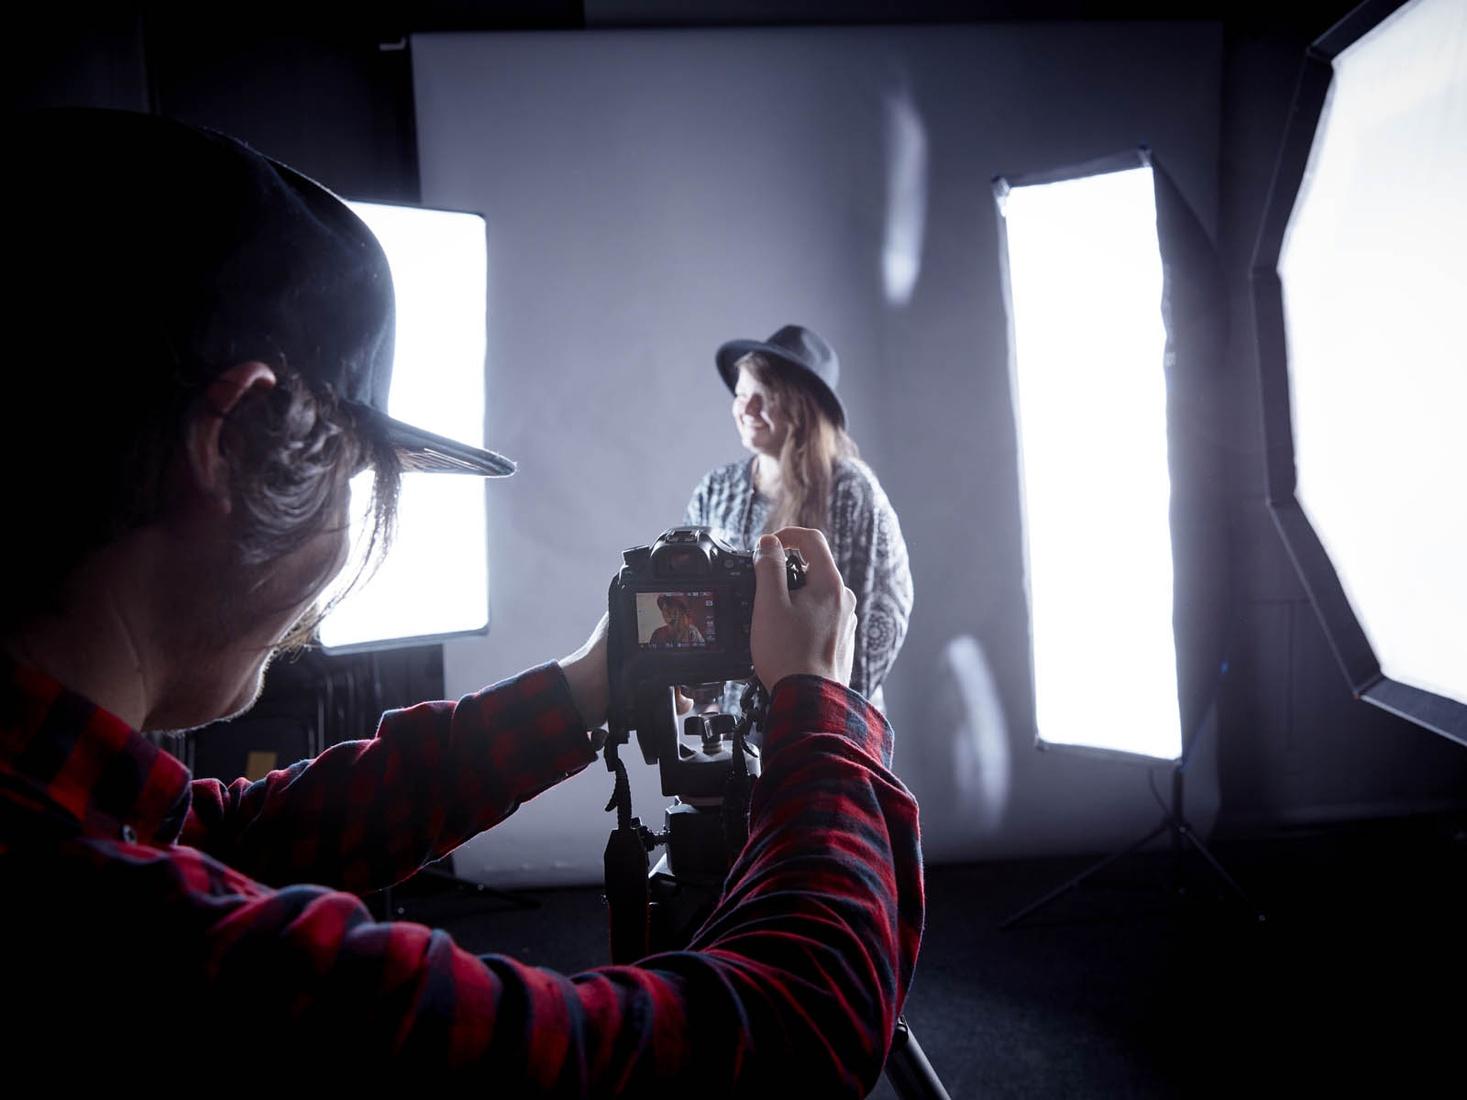 Student taking photo in studio